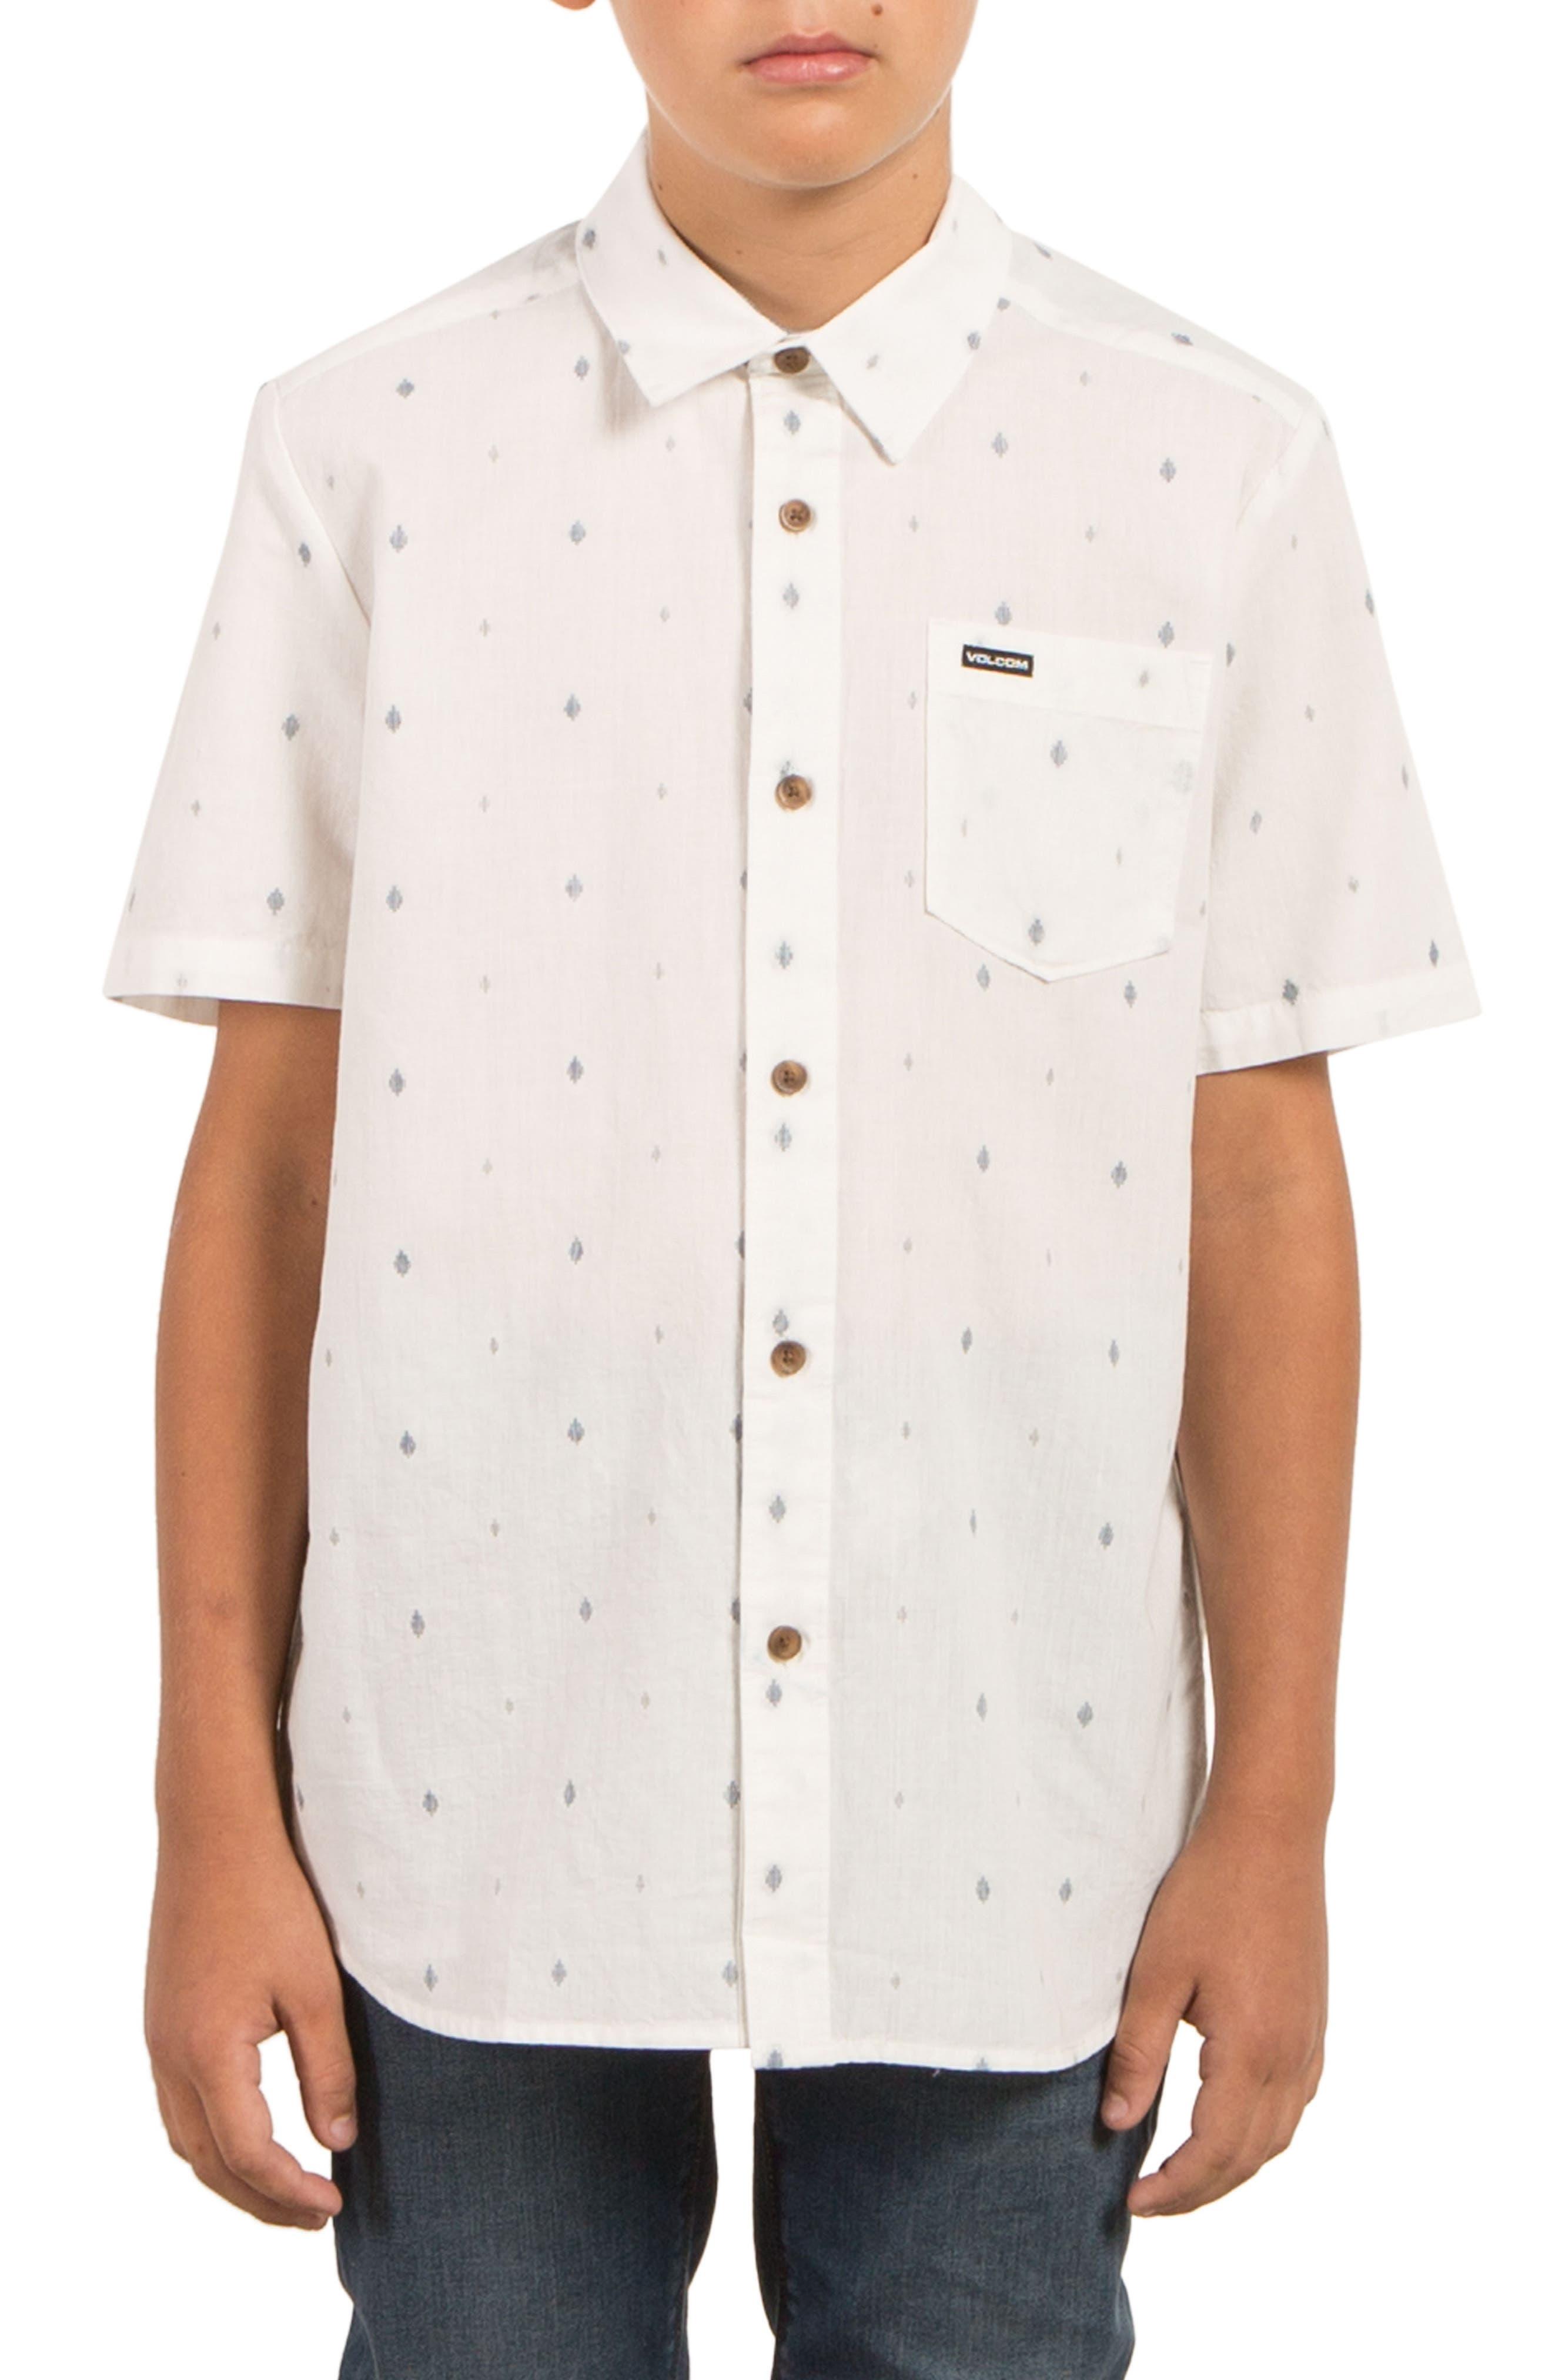 Interlude Print Woven Shirt,                             Main thumbnail 1, color,                             Cloud